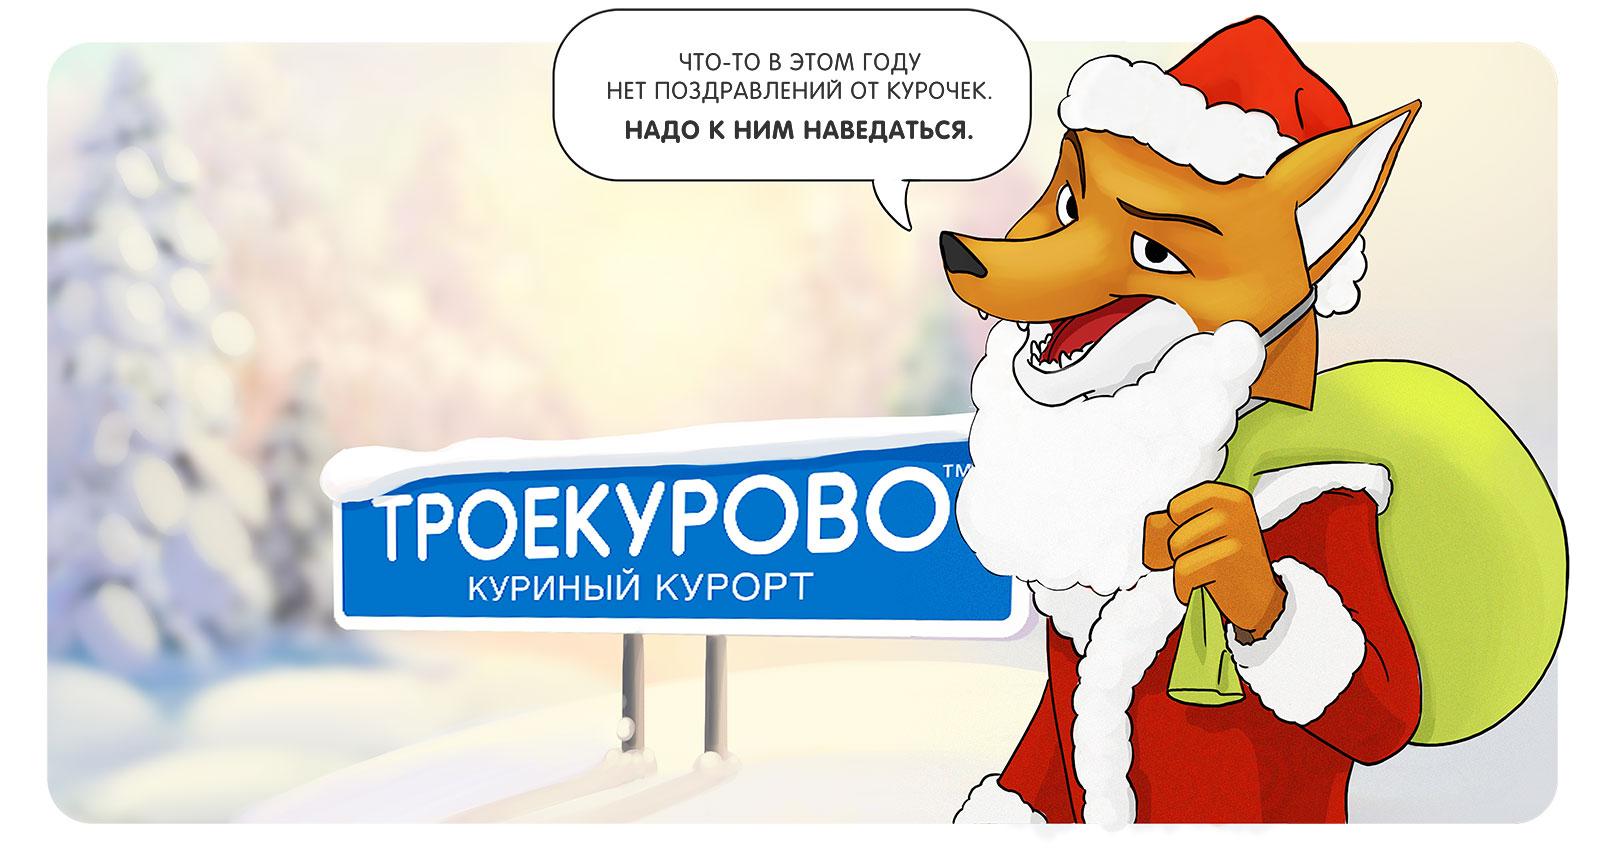 1_january_Troekurovo_smartians